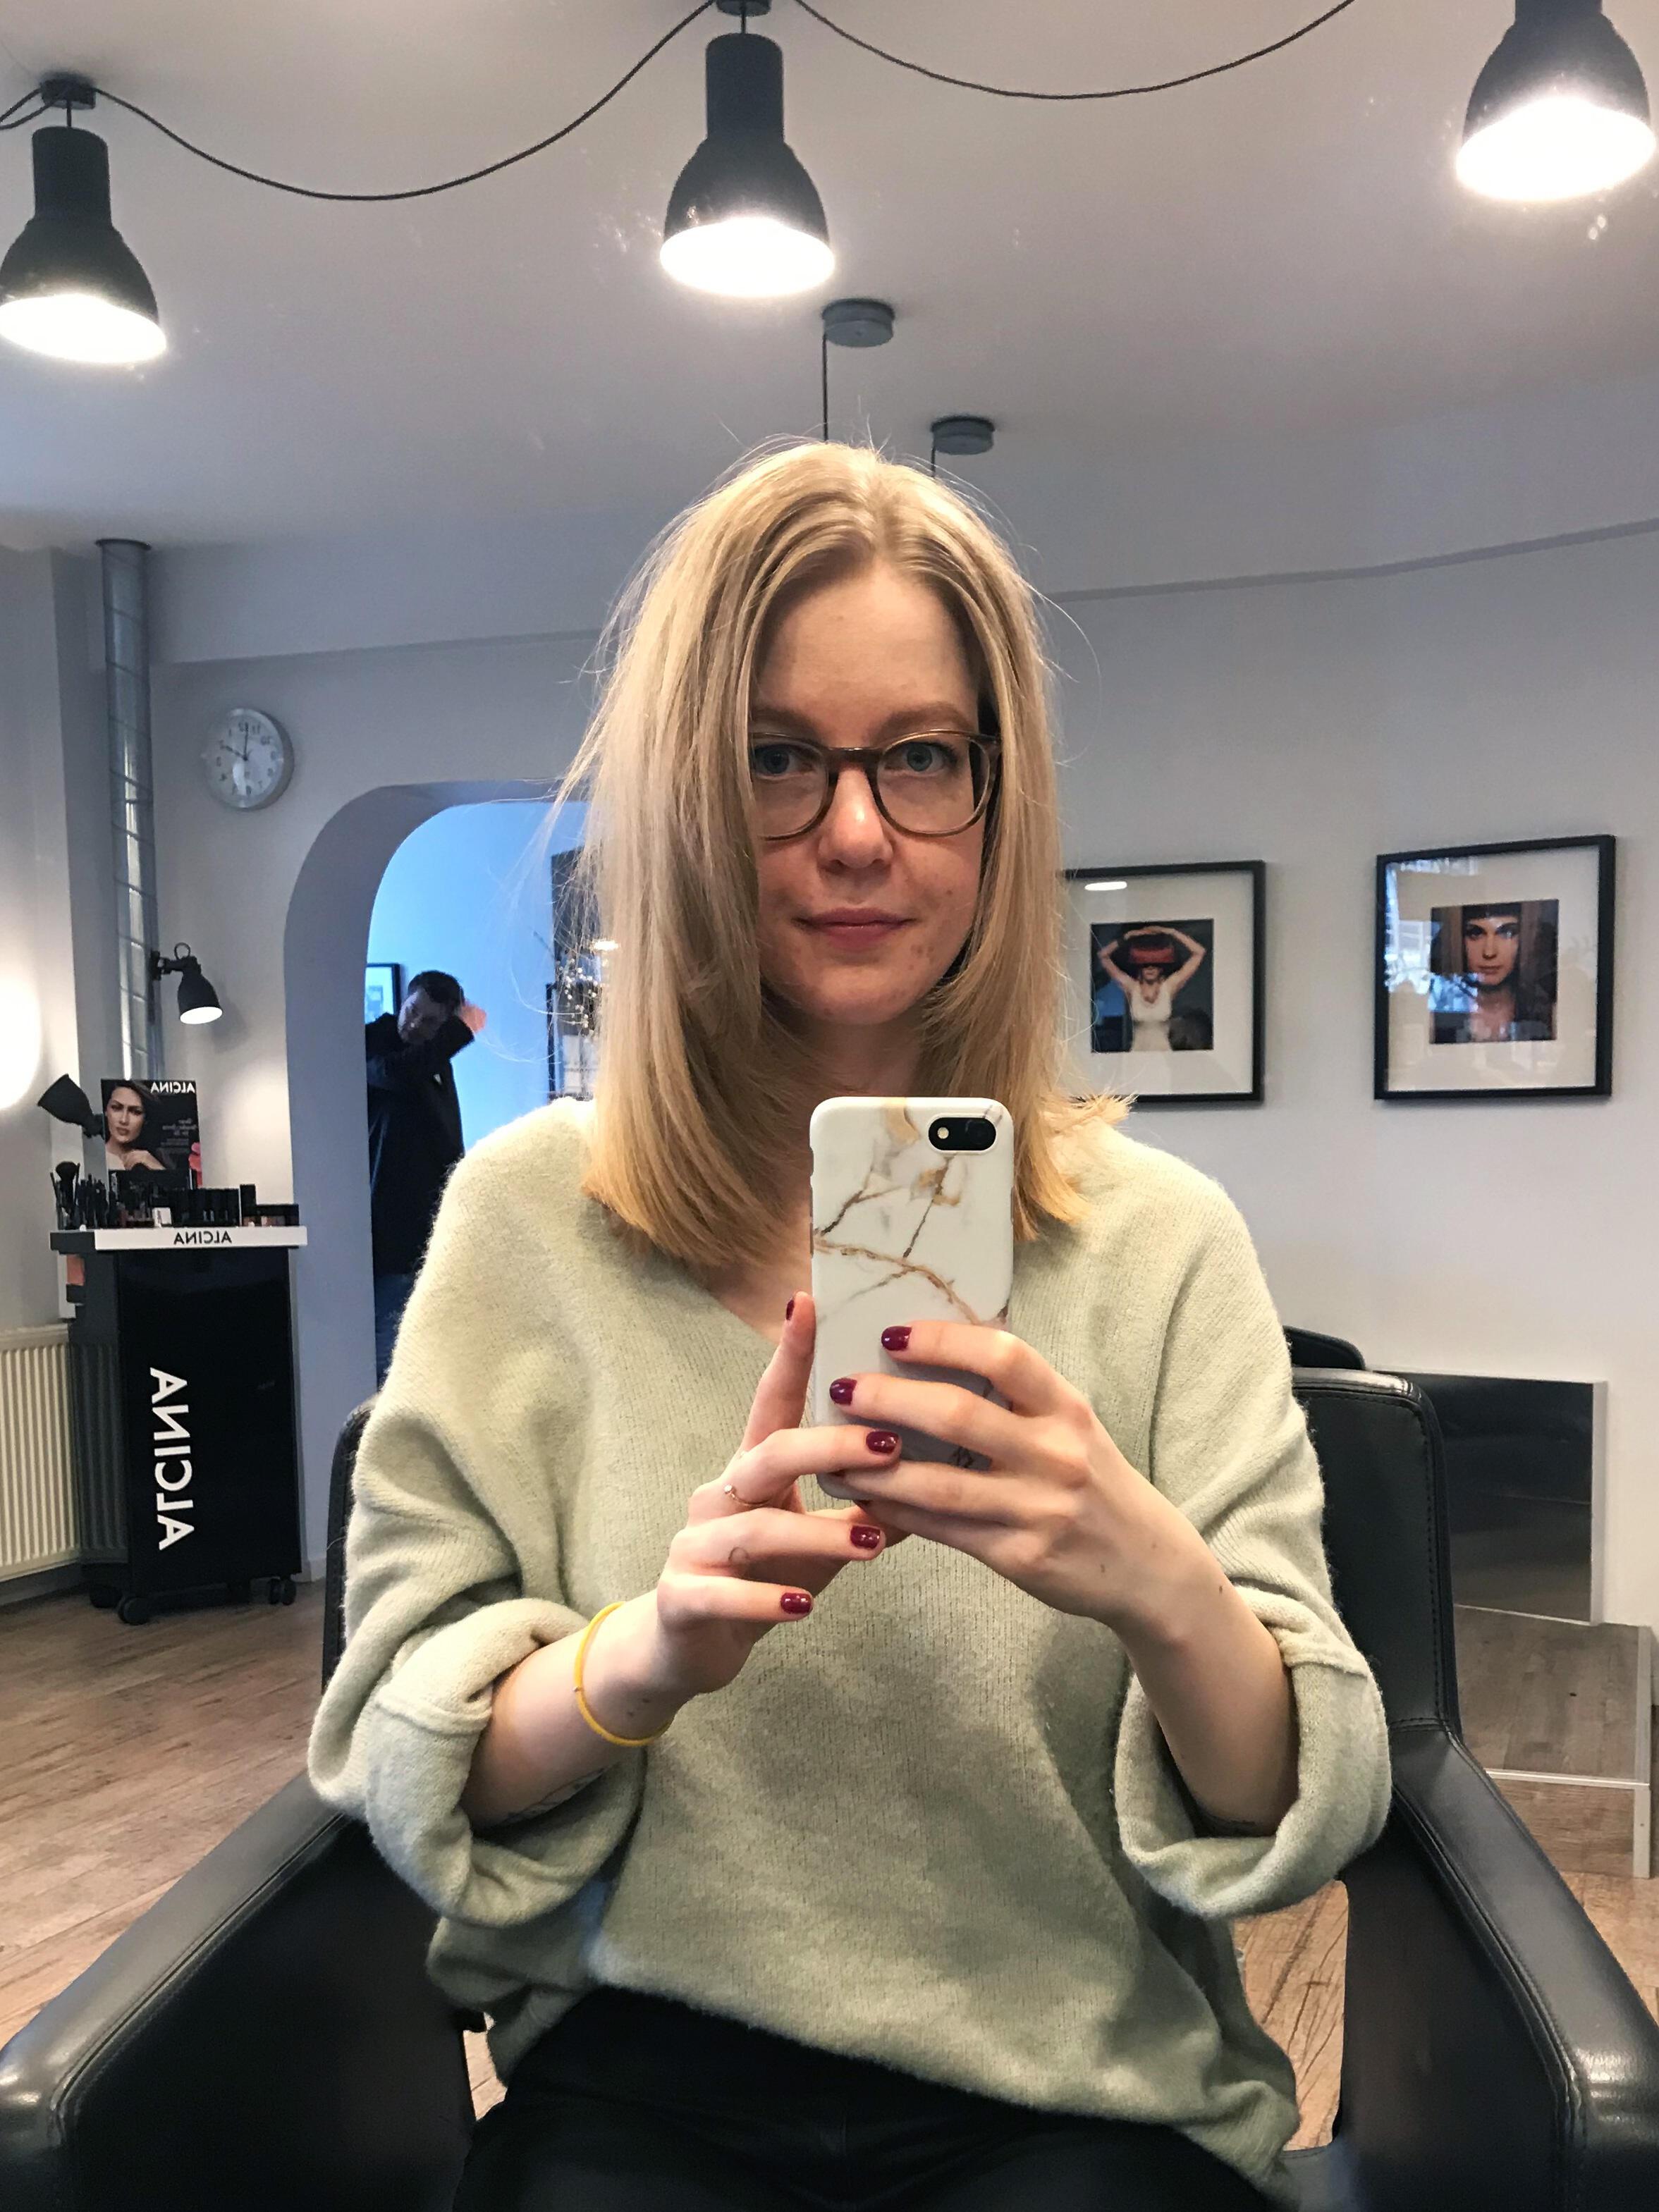 Friseurbesuch